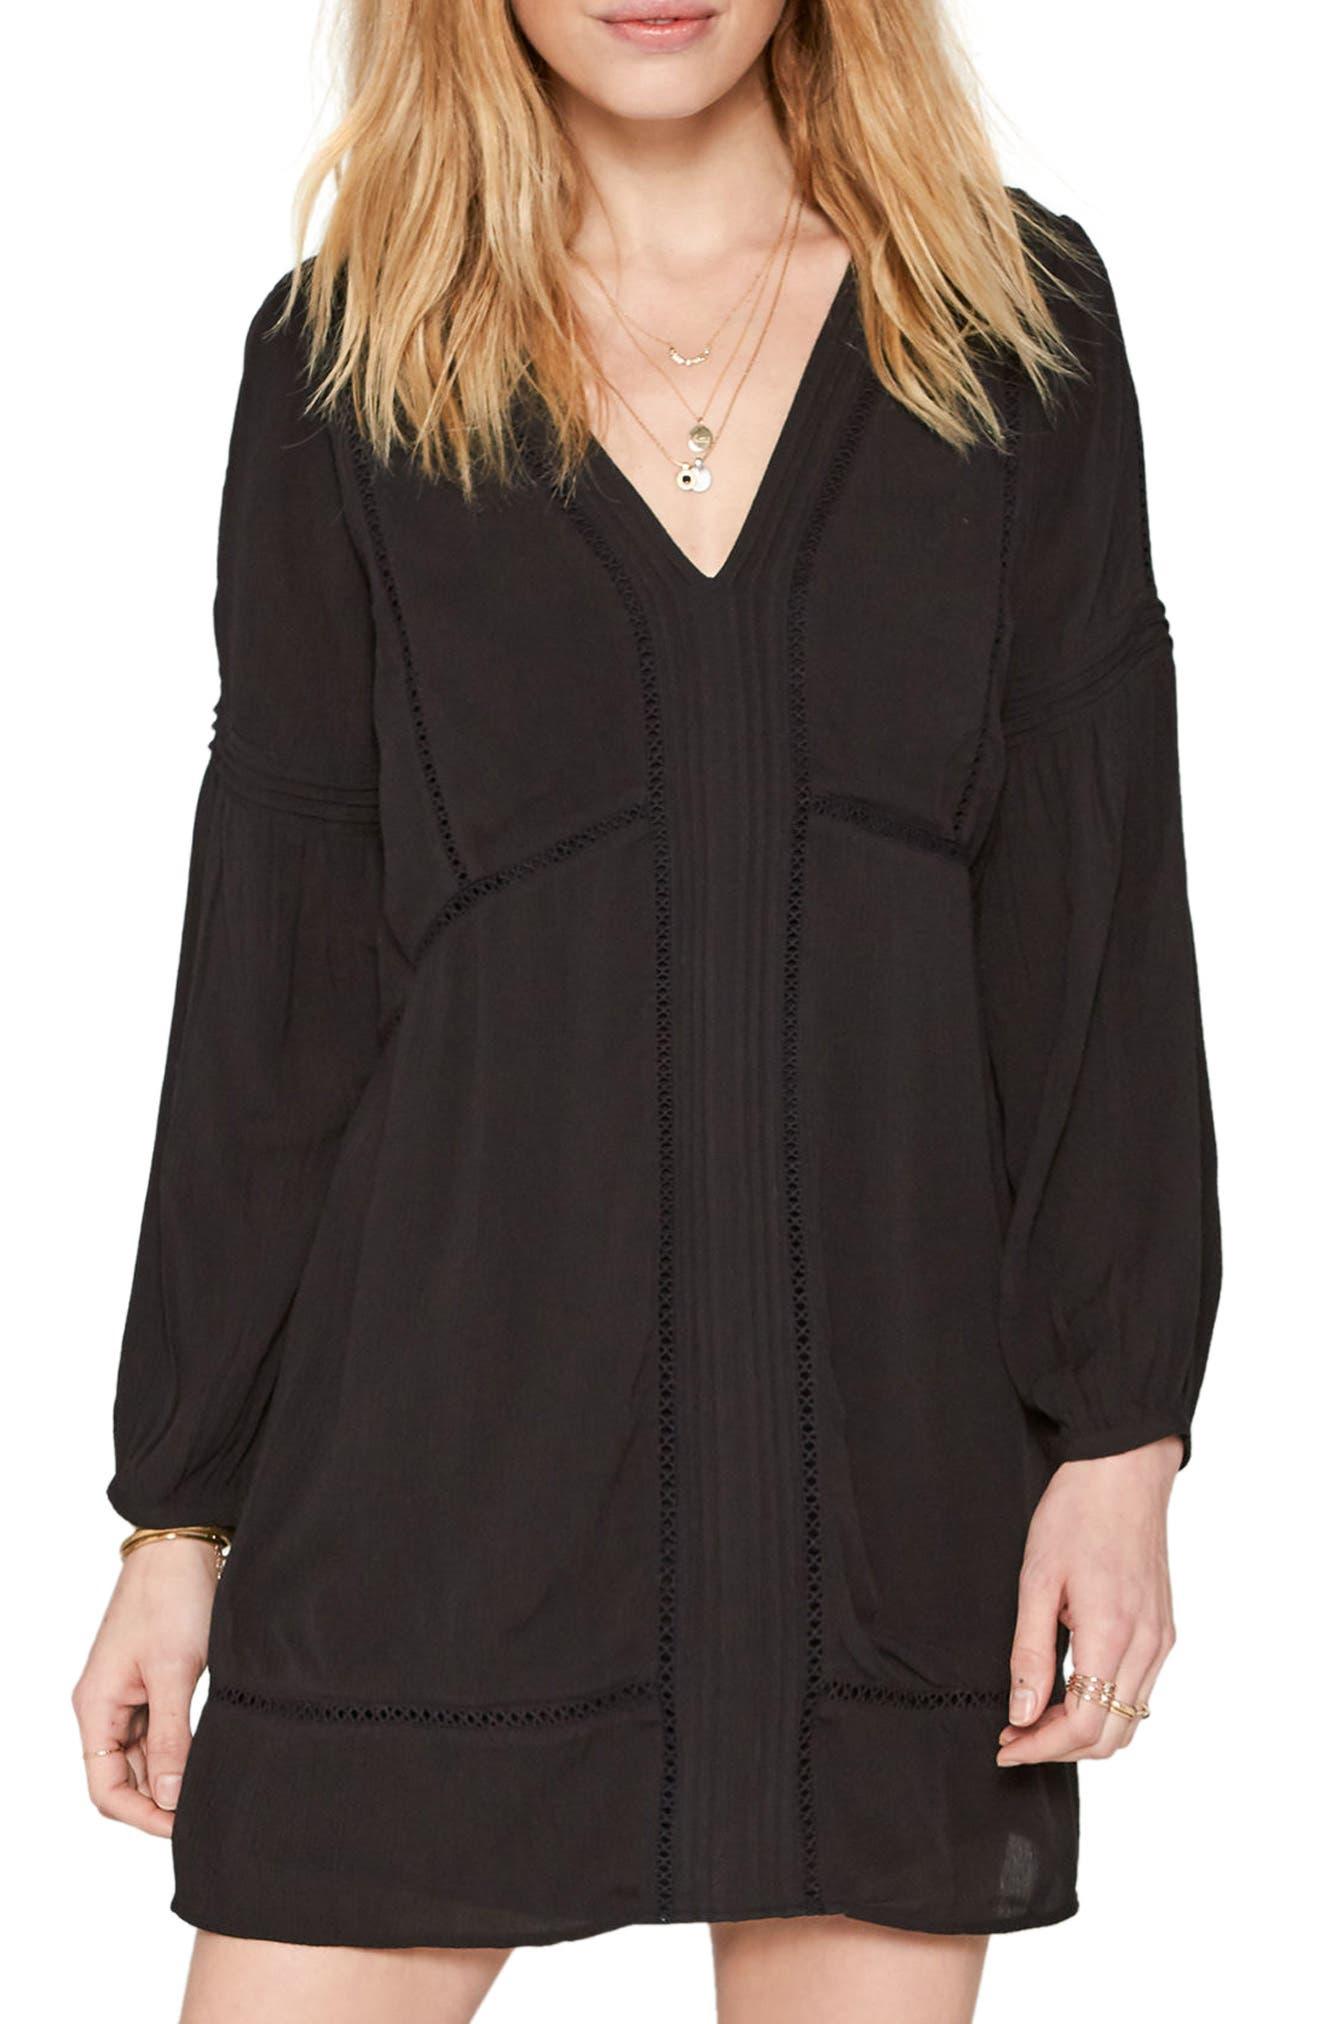 Berkley Dress,                         Main,                         color, 001